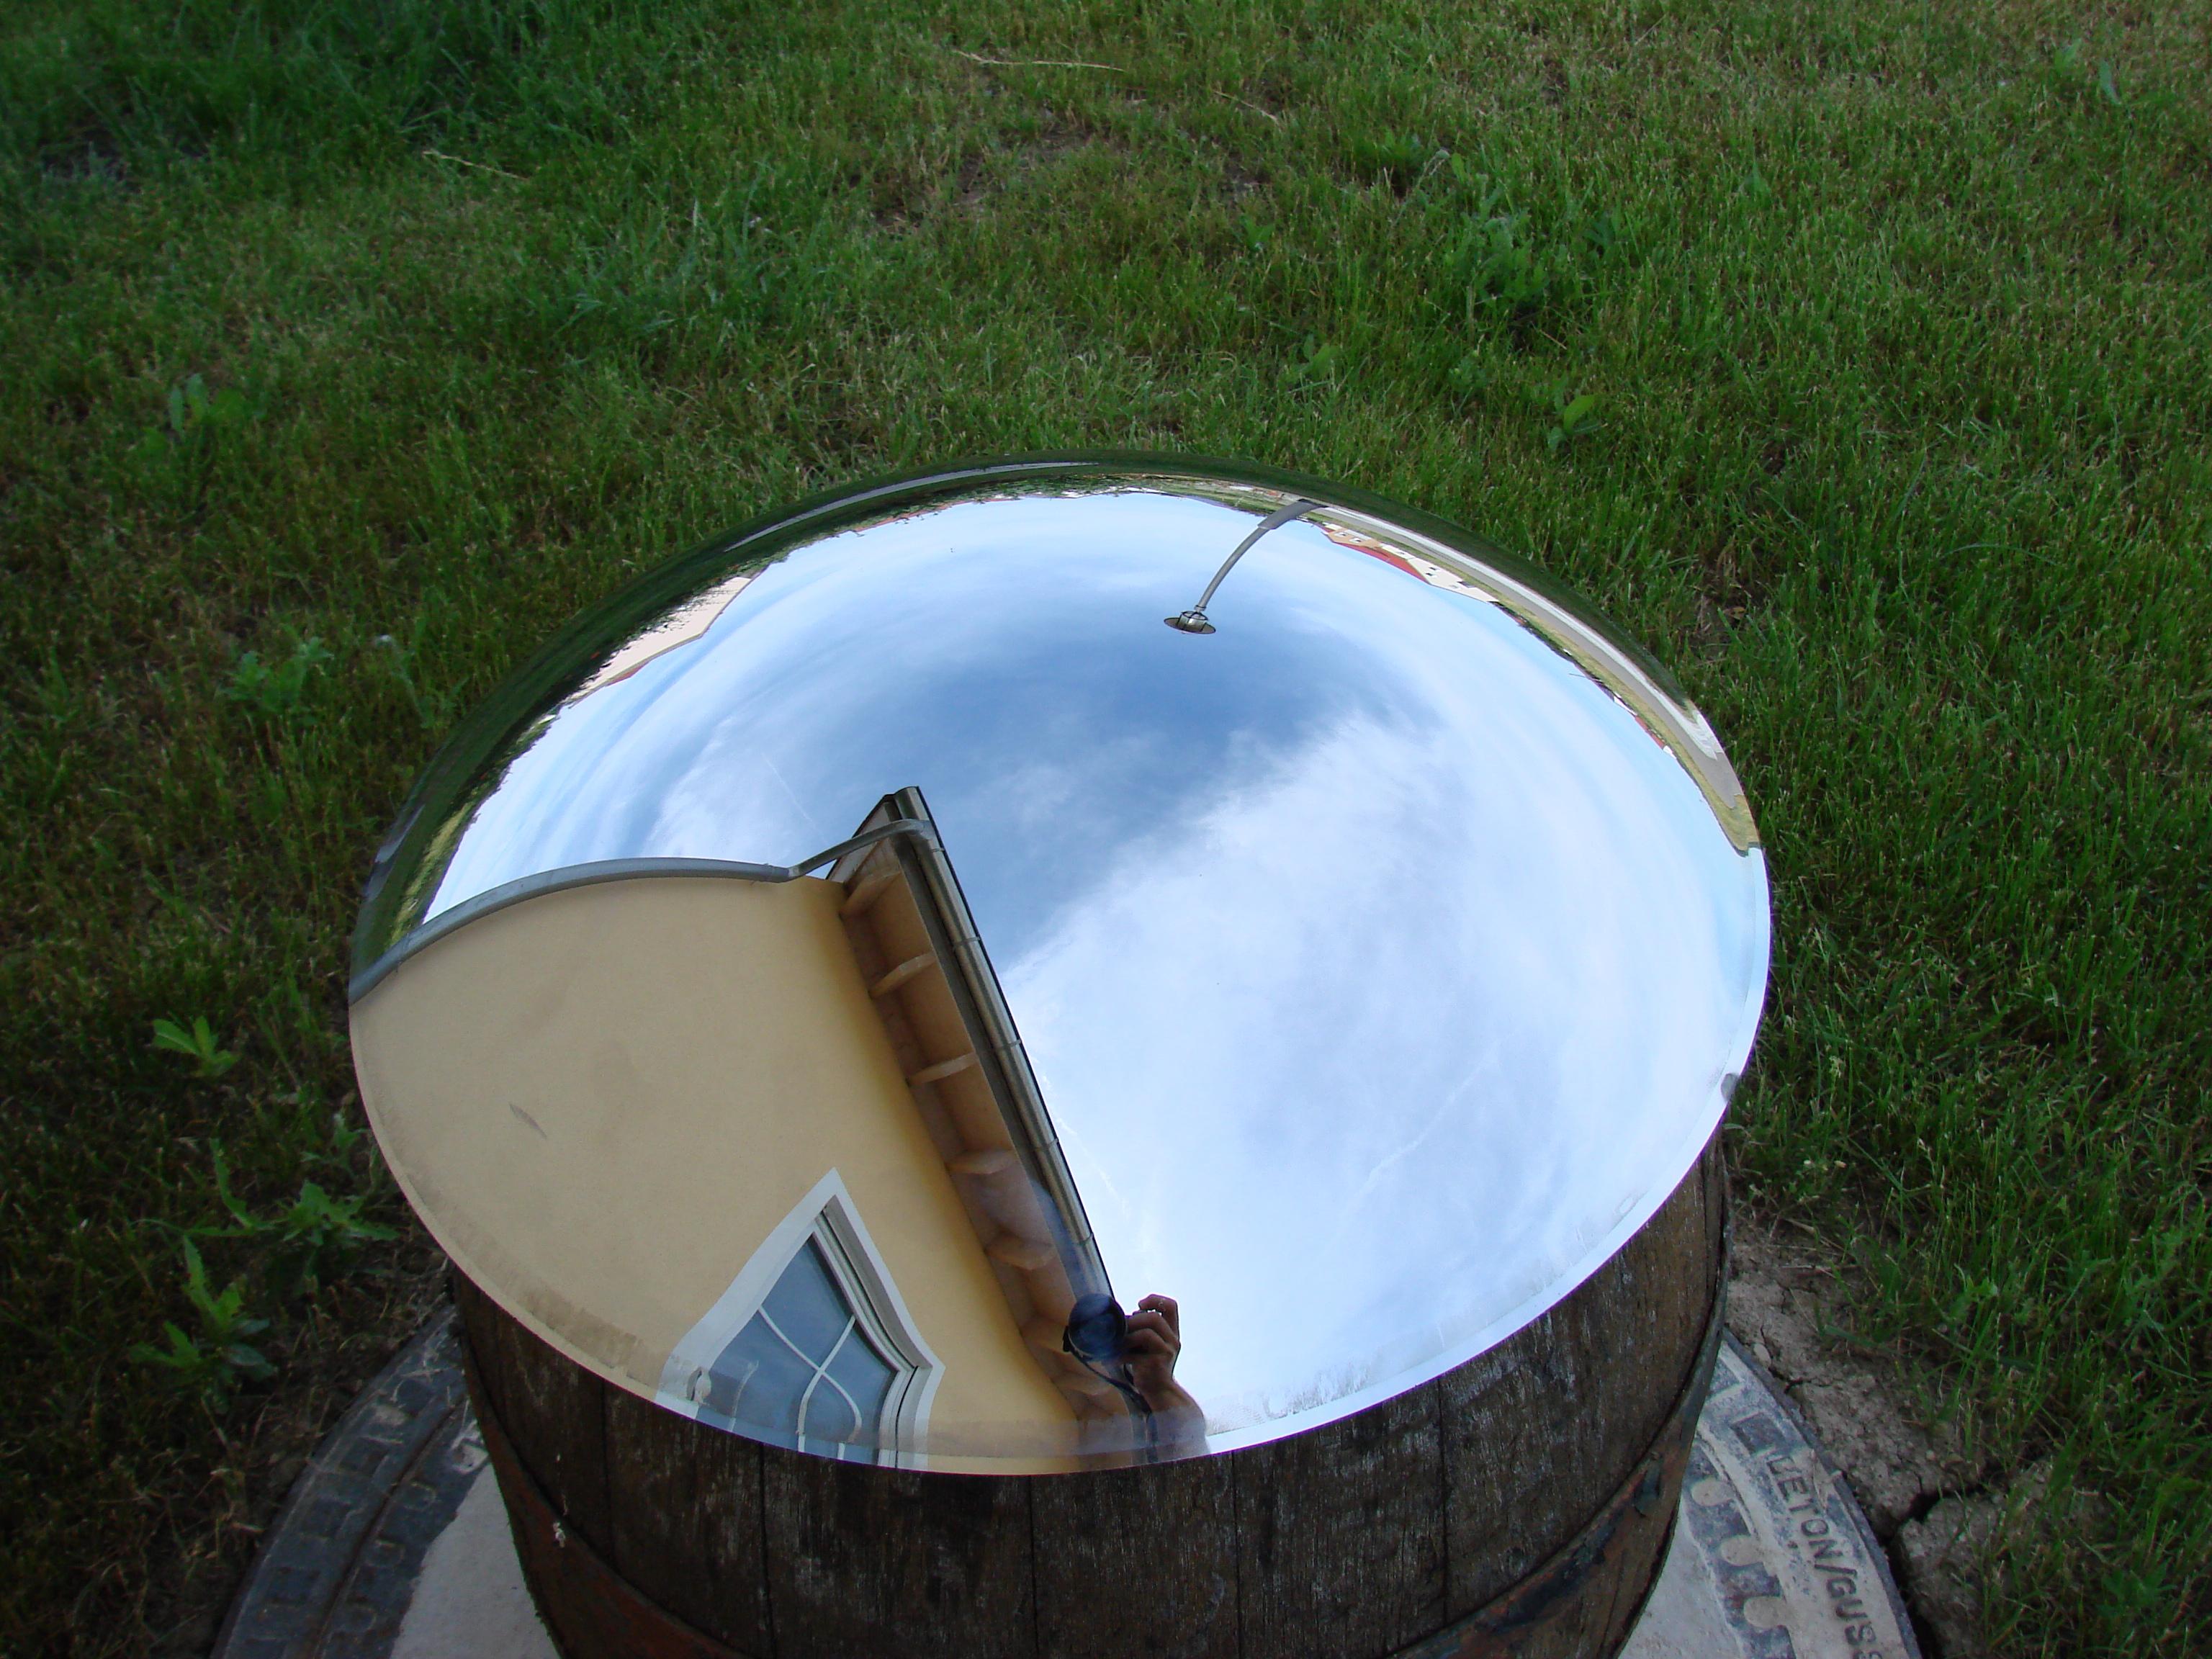 10x Verkehrspiegel 42cm Beobachtungsspiegel Konvex Kontrollspiegel Spiegel